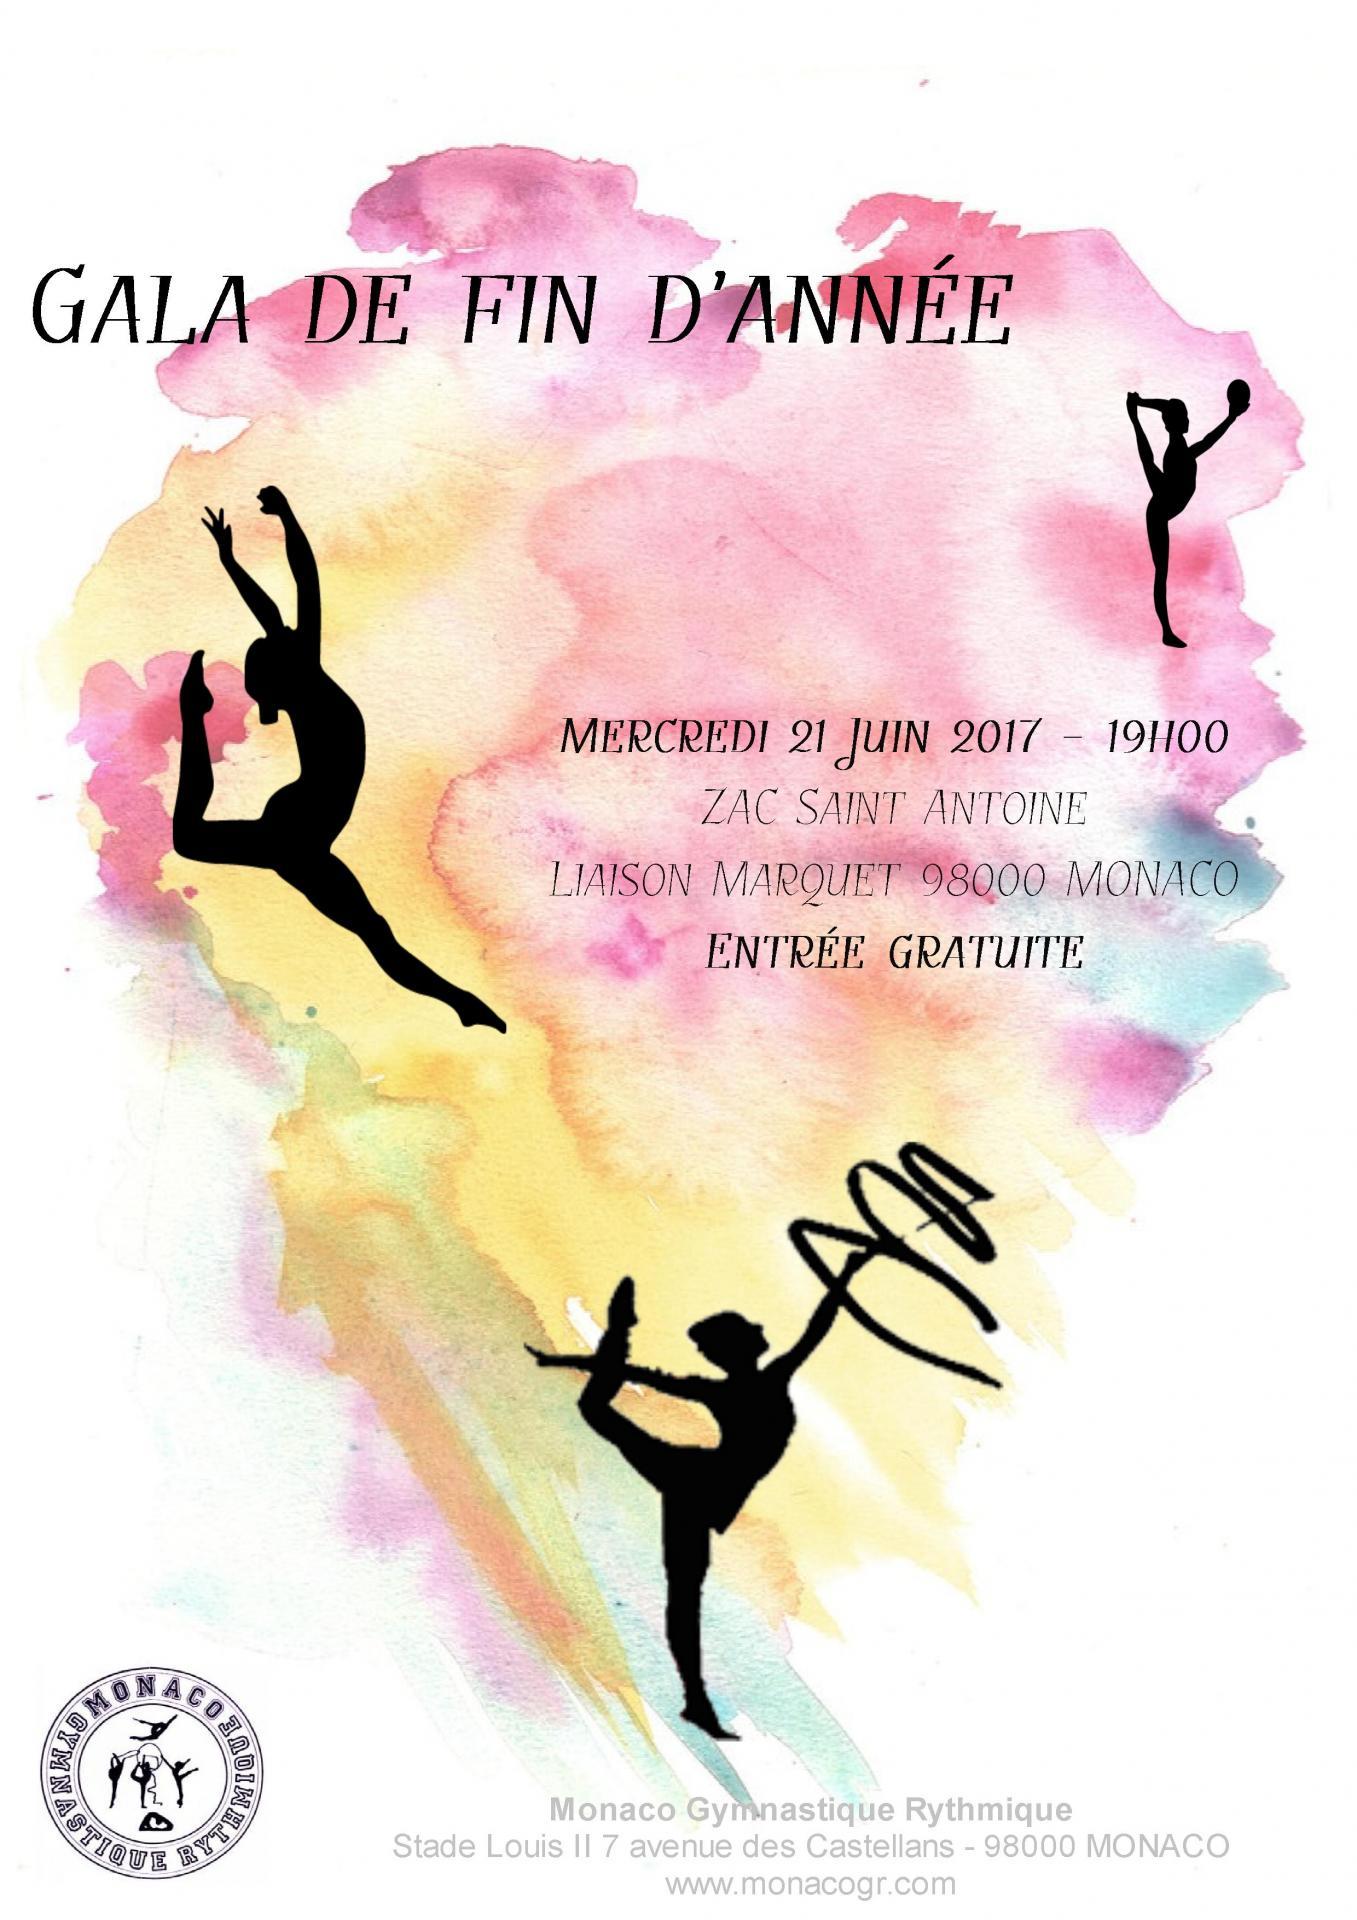 Gr gala 2017